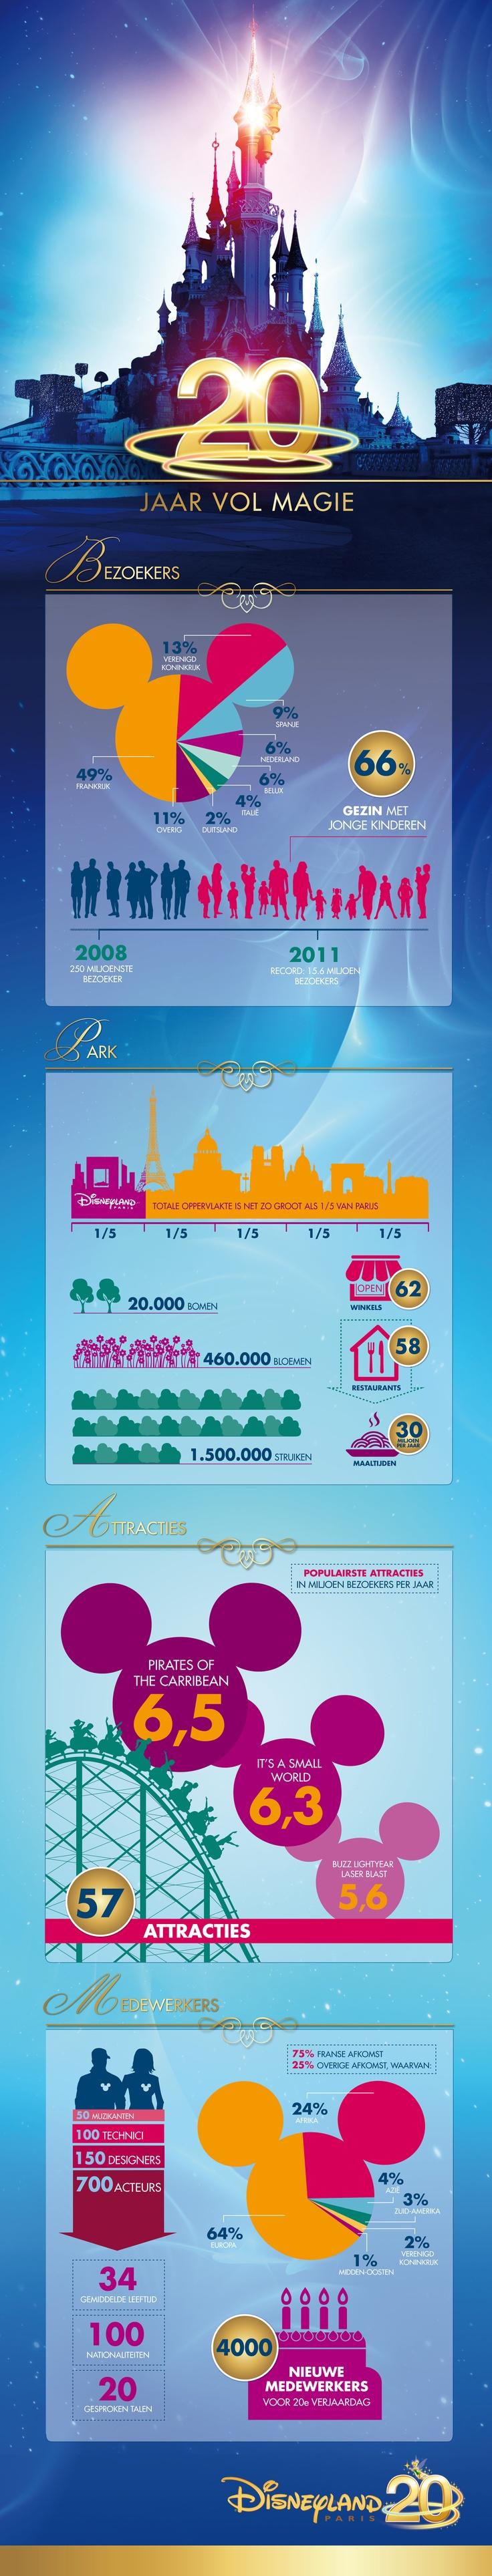 Disneyland Paris viert 20e verjaardag. #infographic #Disneyland20